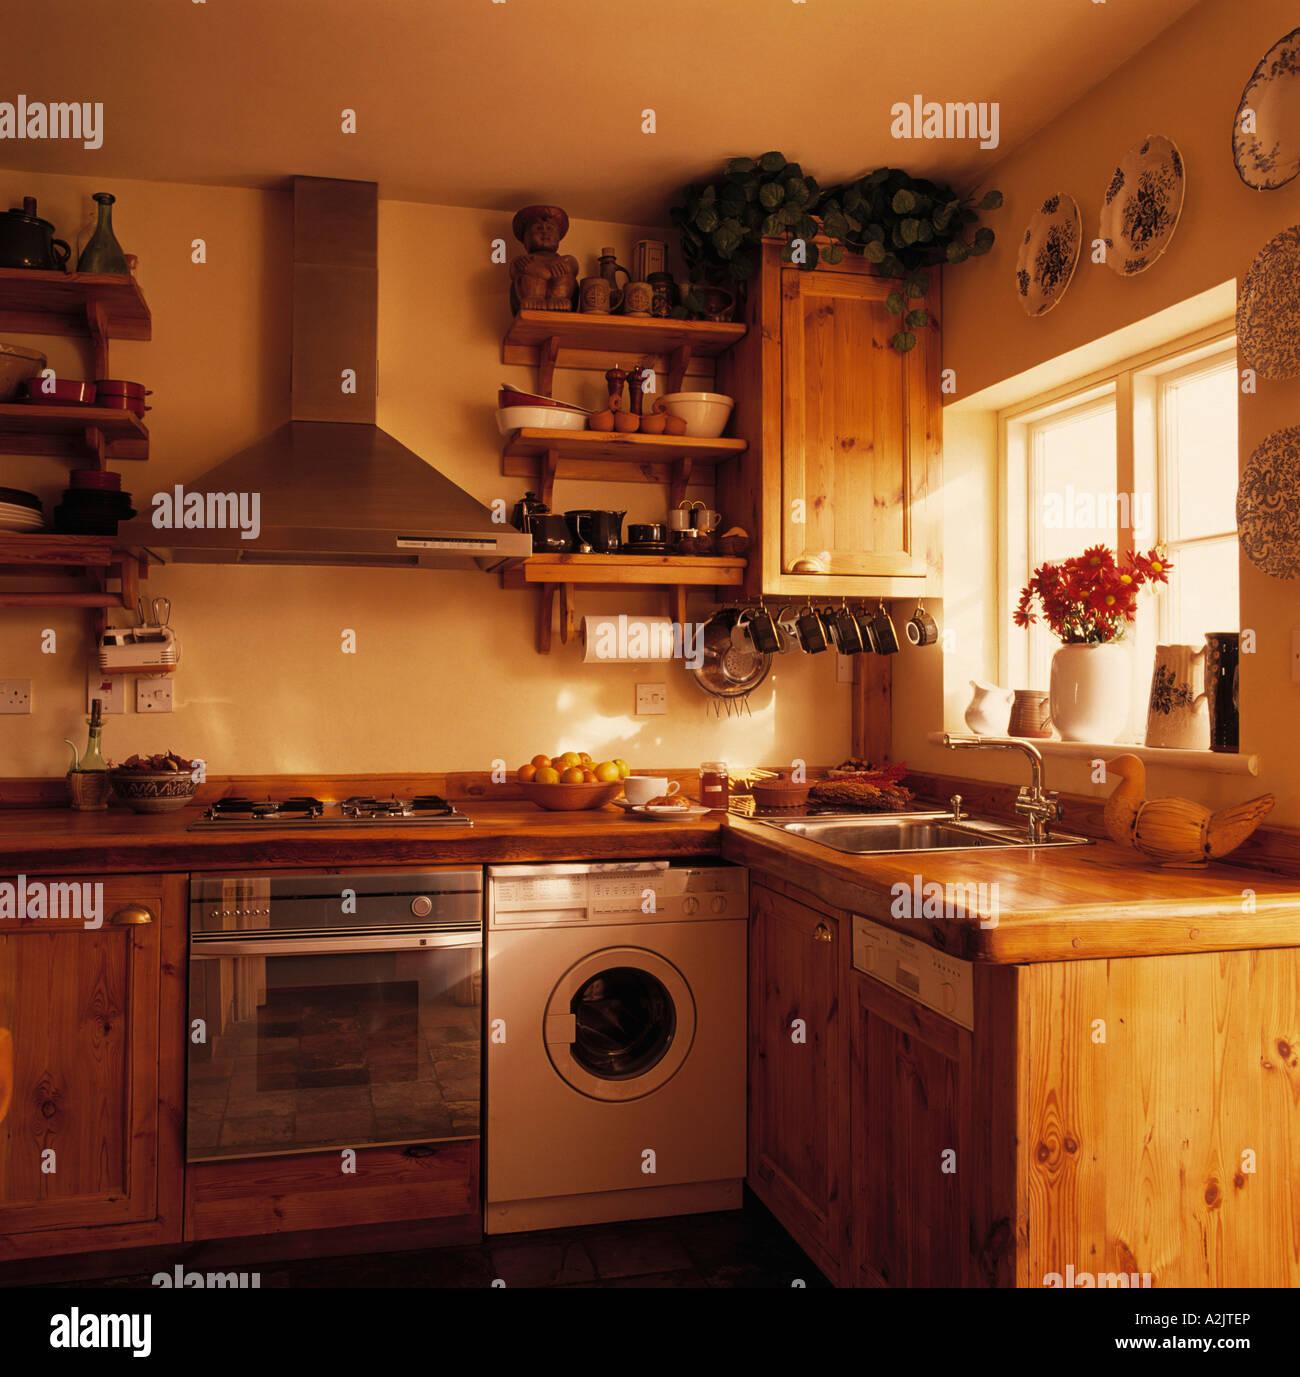 Hermosa Paquete De Electrodomésticos De Cocina Ocupa Reino Unido ...